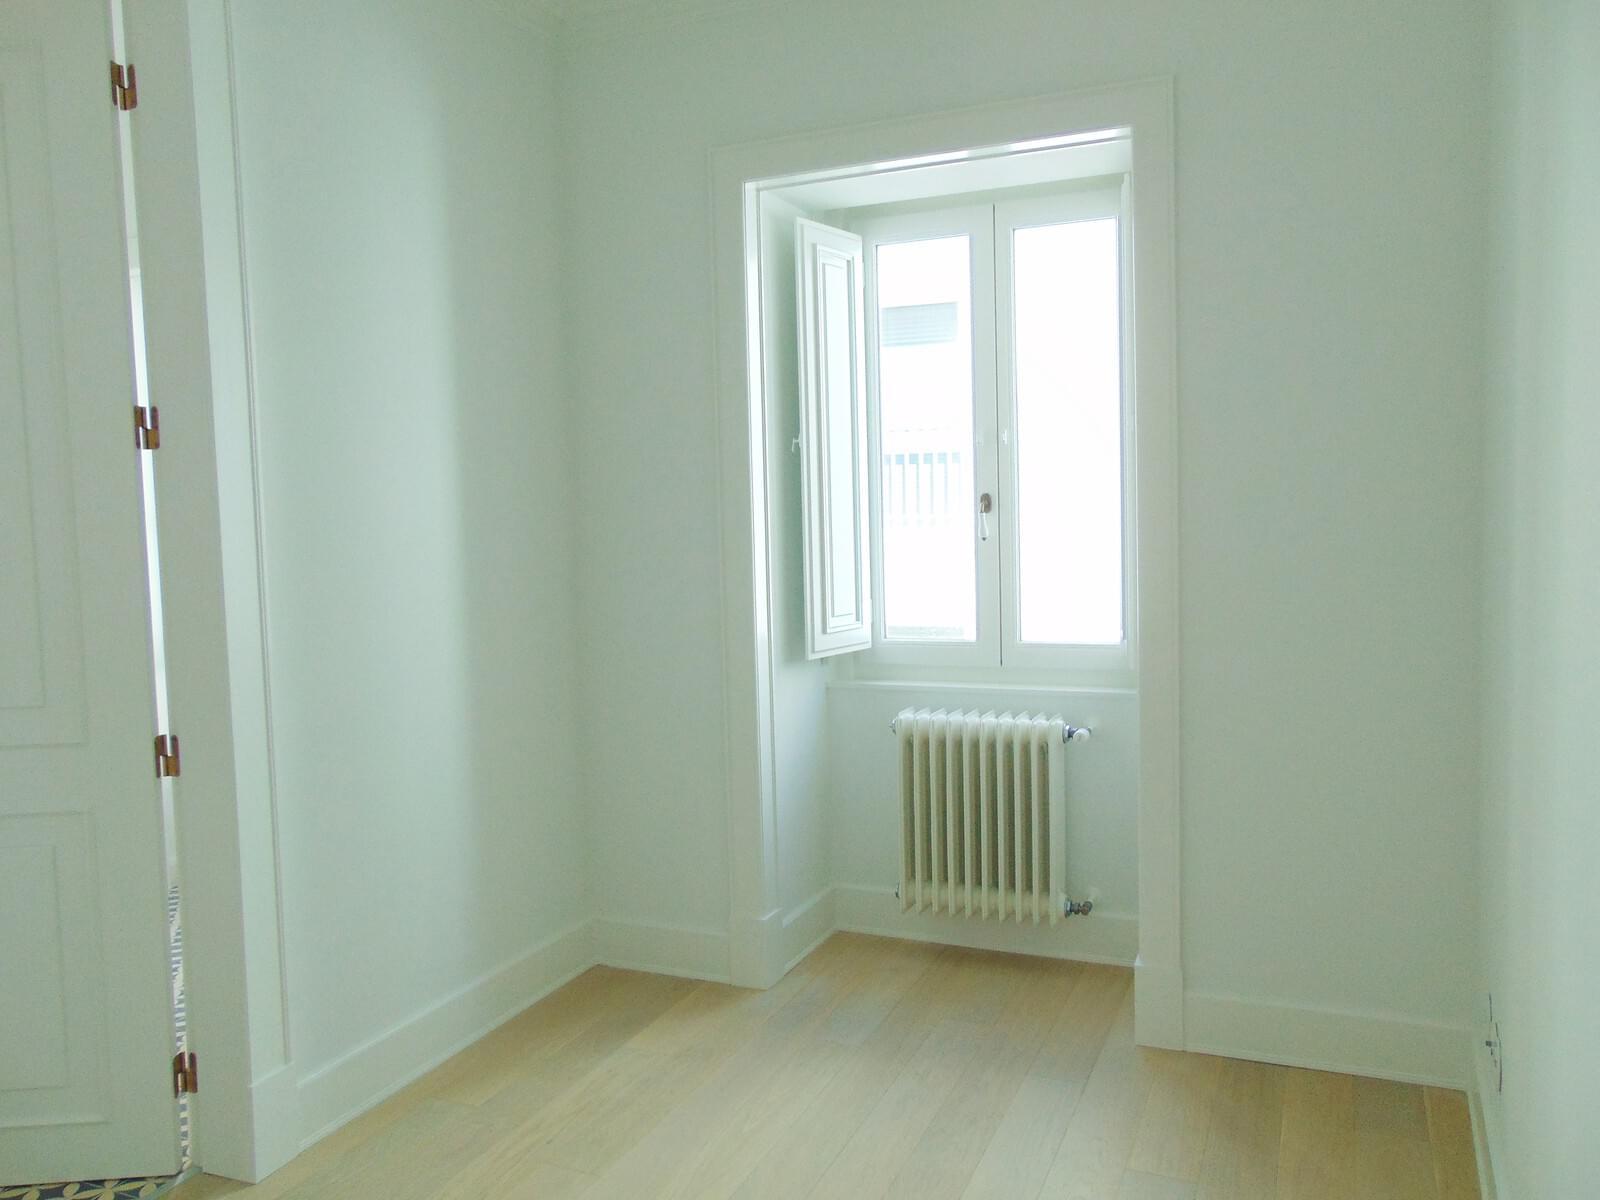 pf18152-apartamento-t2-lisboa-57a29a11-ae4c-4c48-ae22-533d904fb919